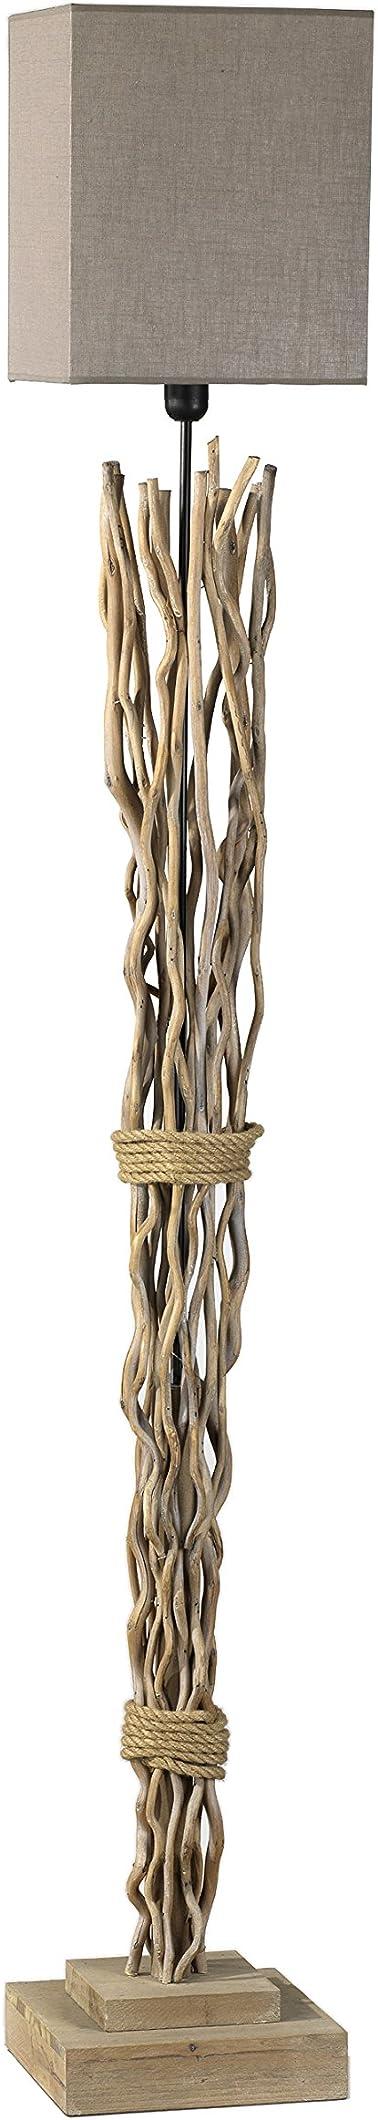 Piantana in legno, paralume in tela color sabbia onli marica 4850/PT